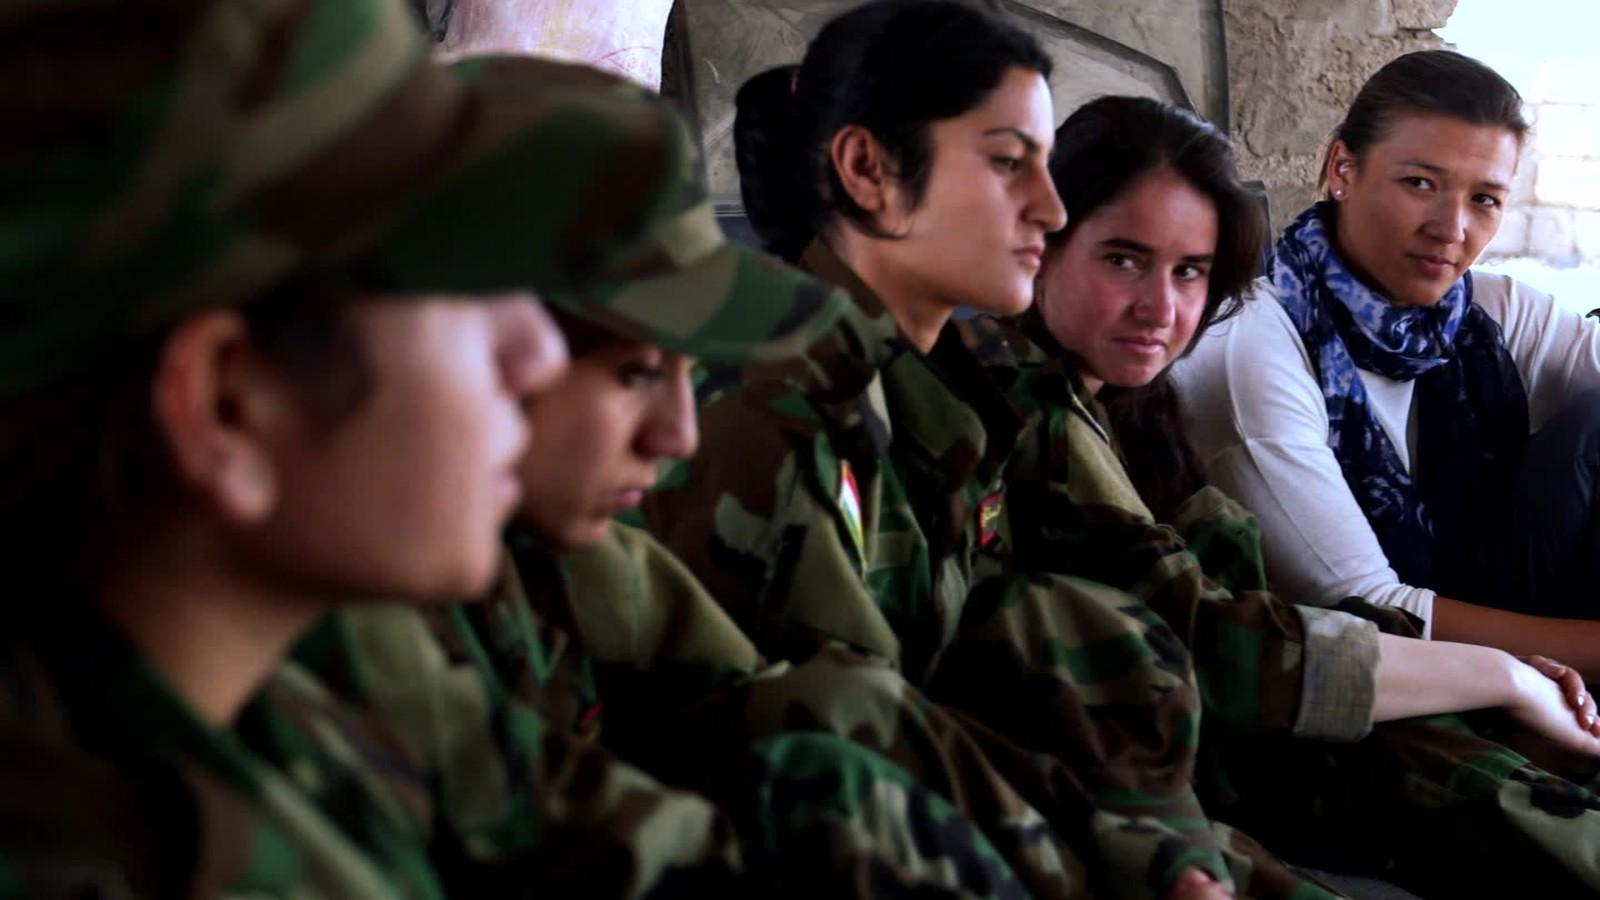 151007121748-xate-shingali-peshmerga-yazidi-isis-pkg-00013830-full-169.jpg